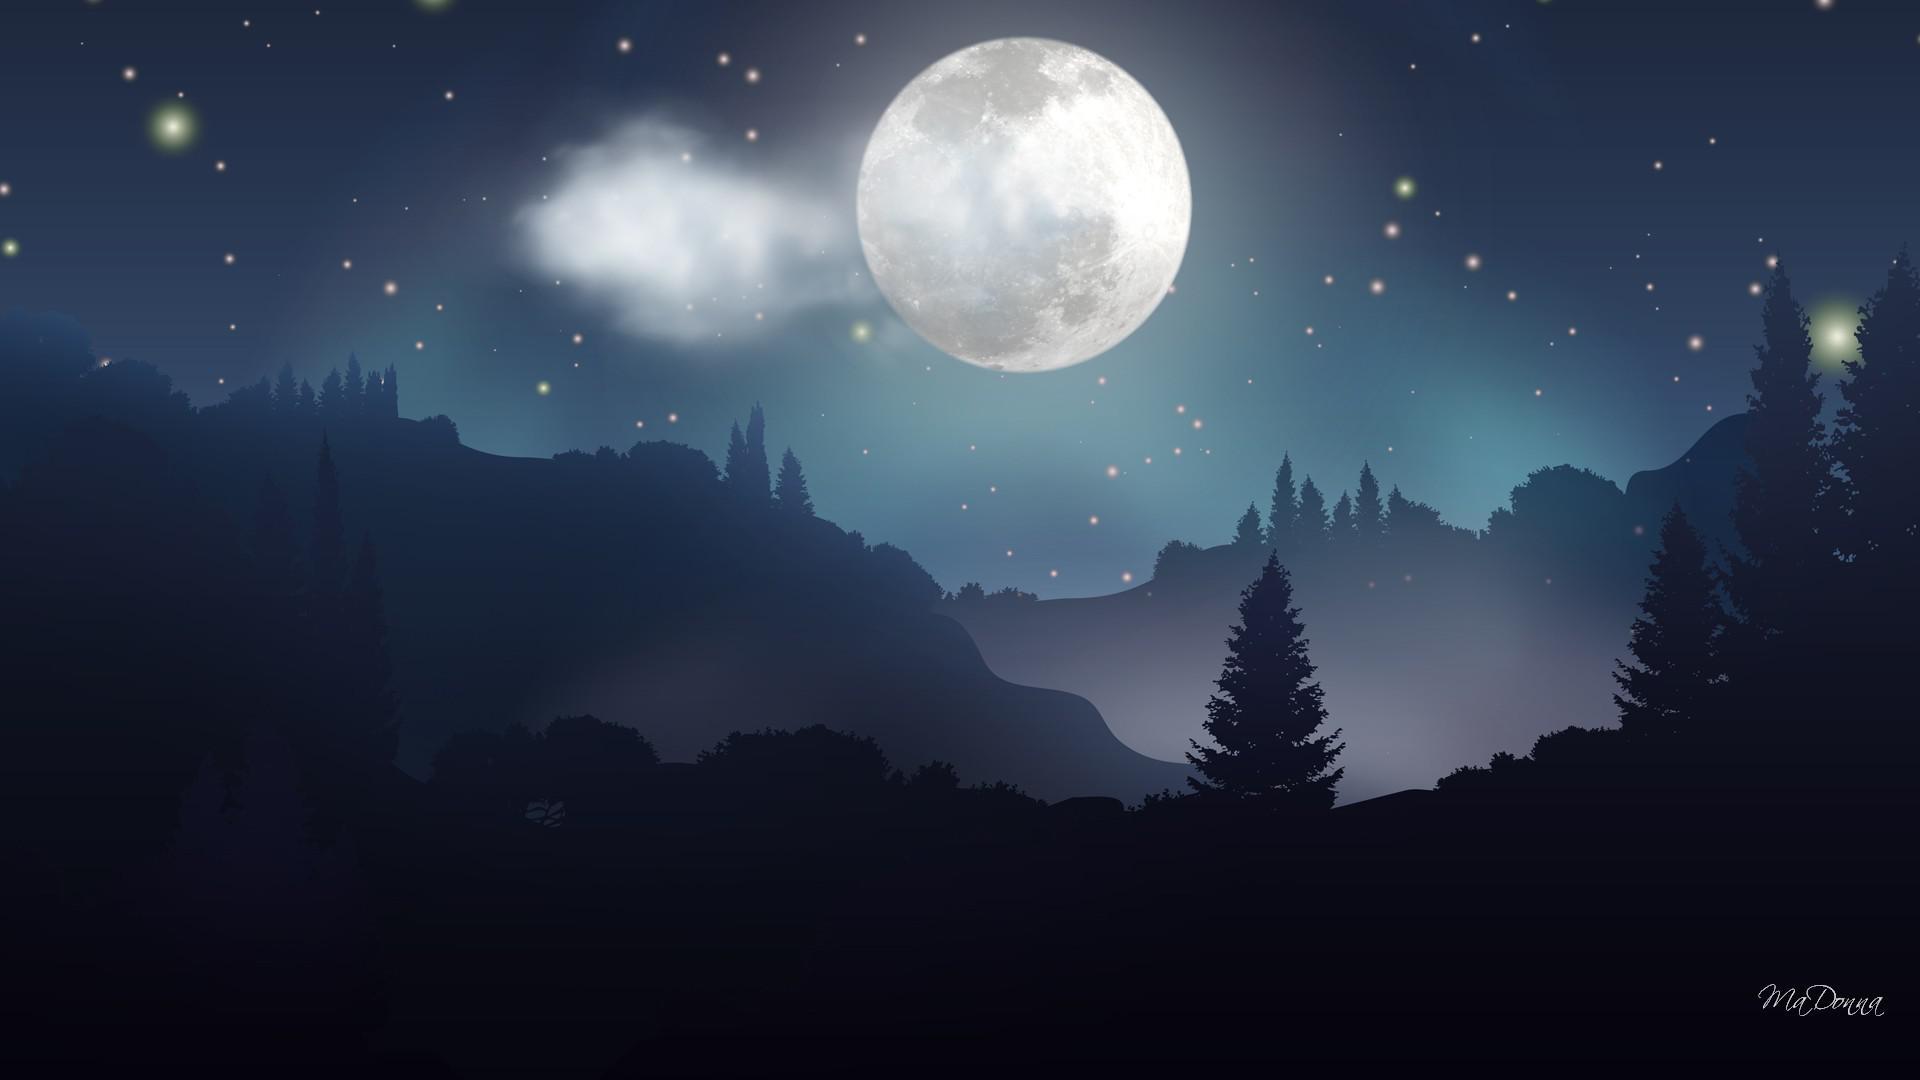 Moonlight Background